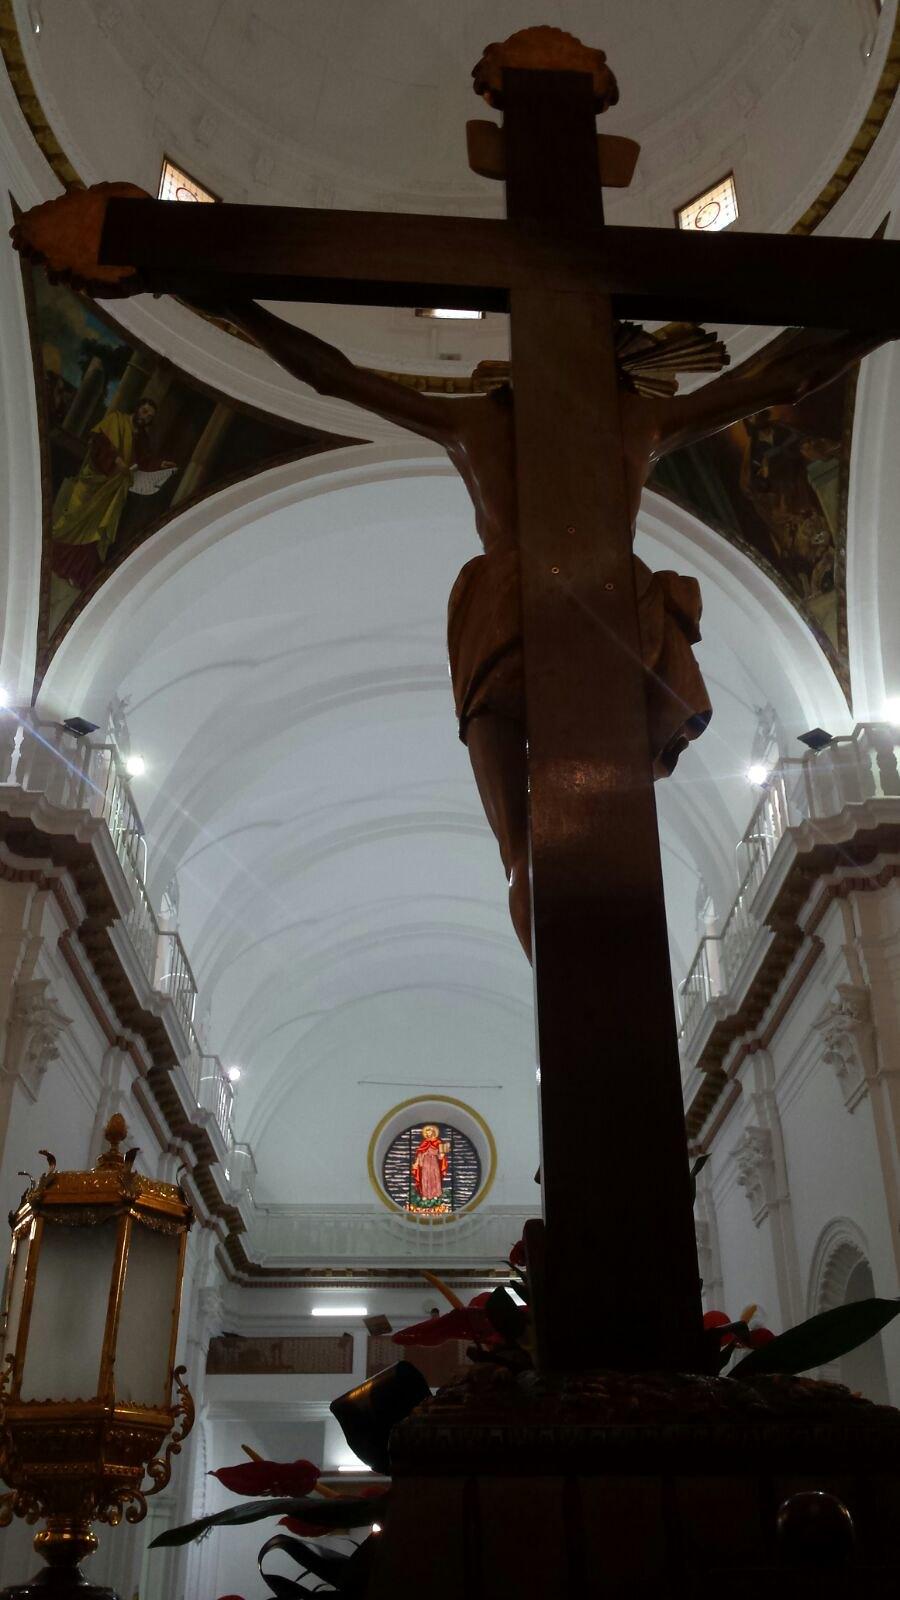 (2017-06-23) Vía Crucis de bajada - Manolo Miralles Romero (2)